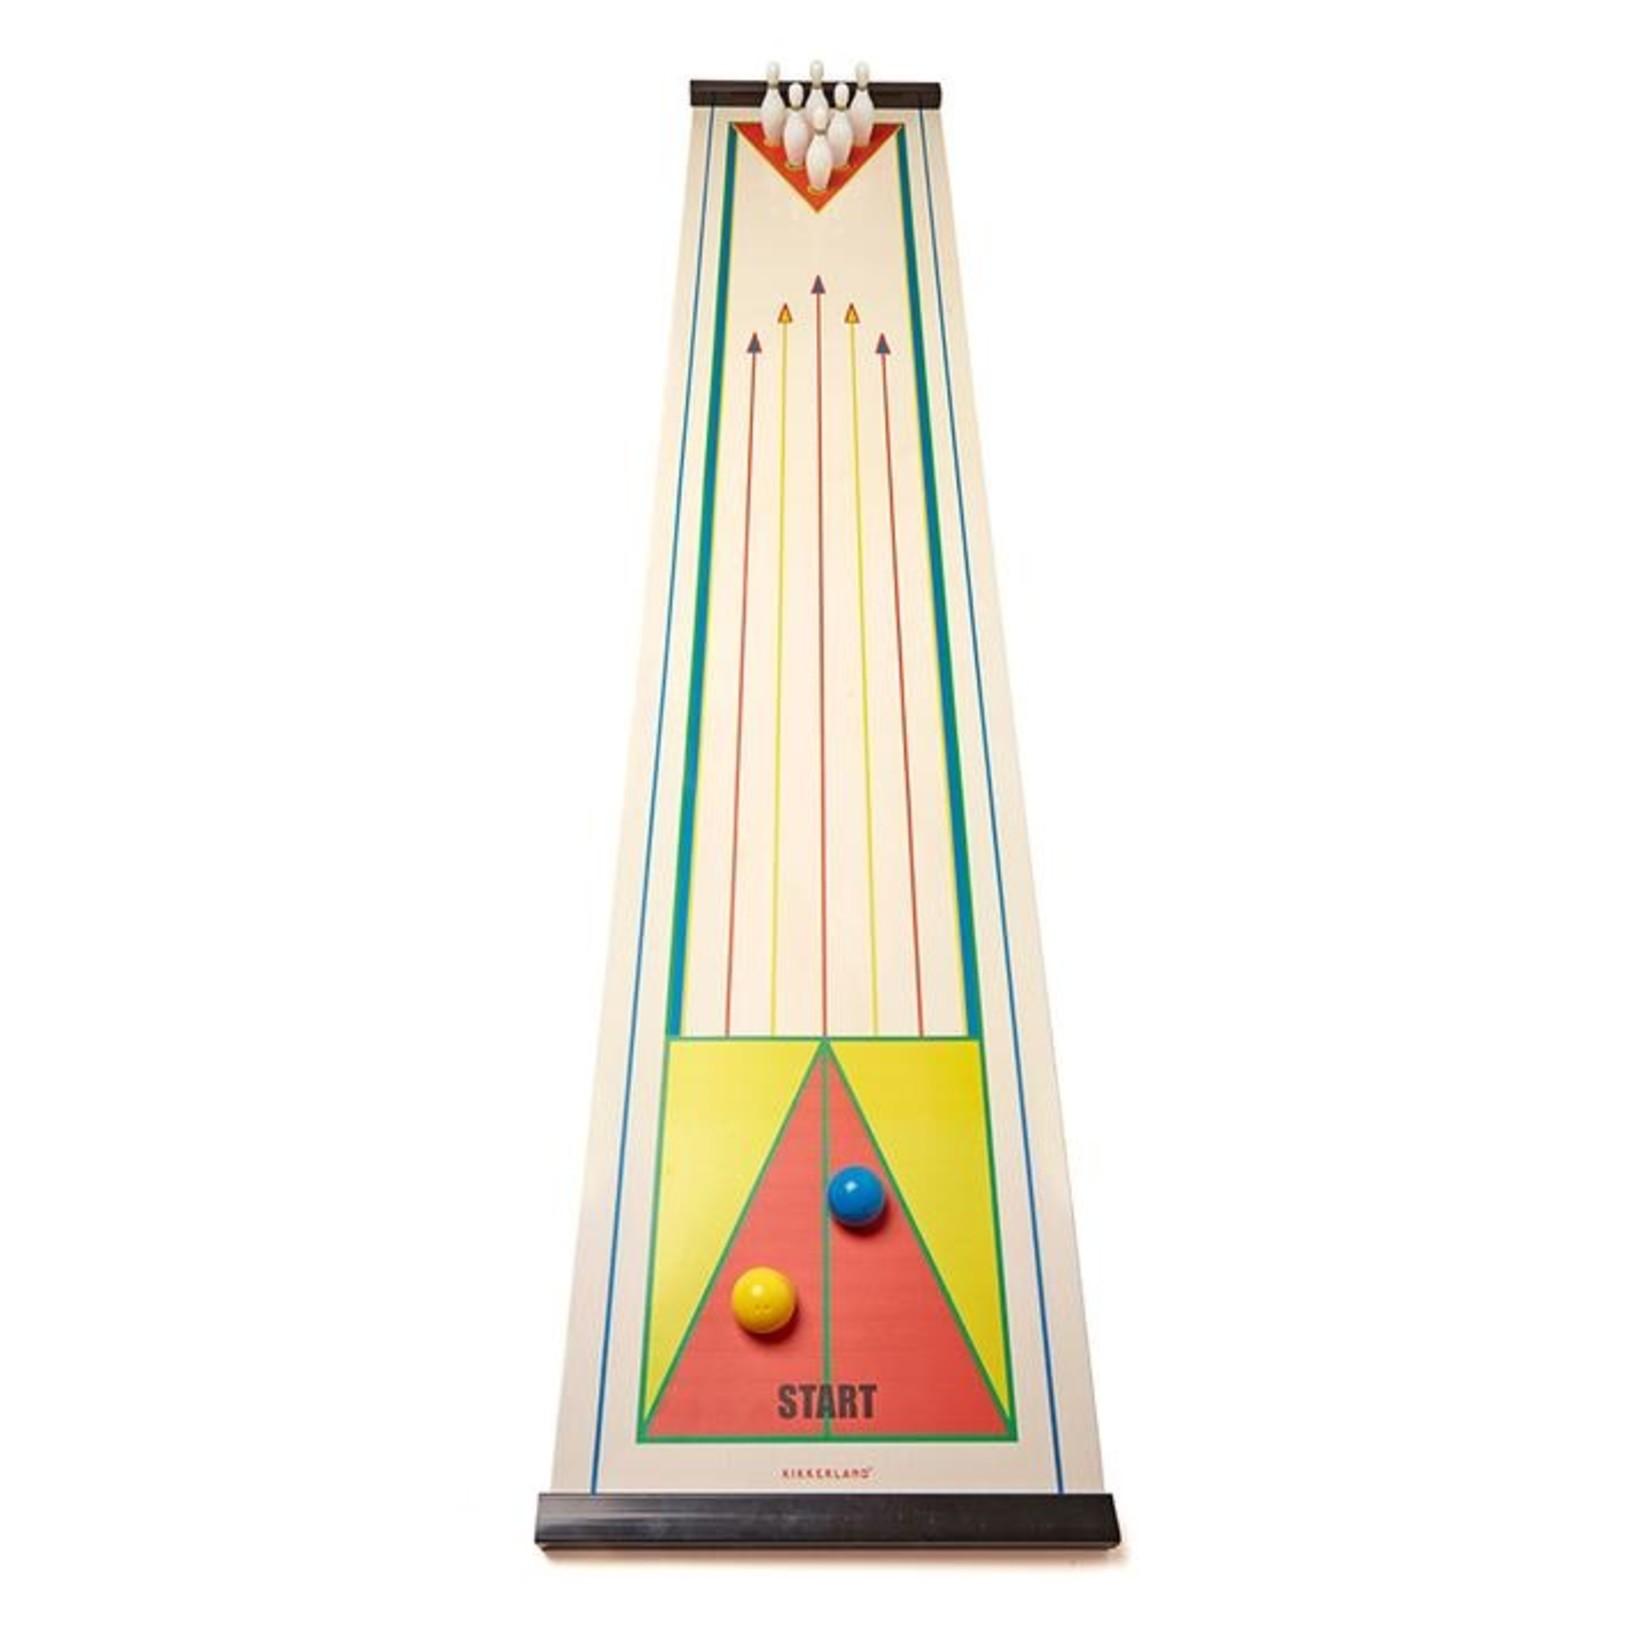 Kikkerland Tabletop Bowling